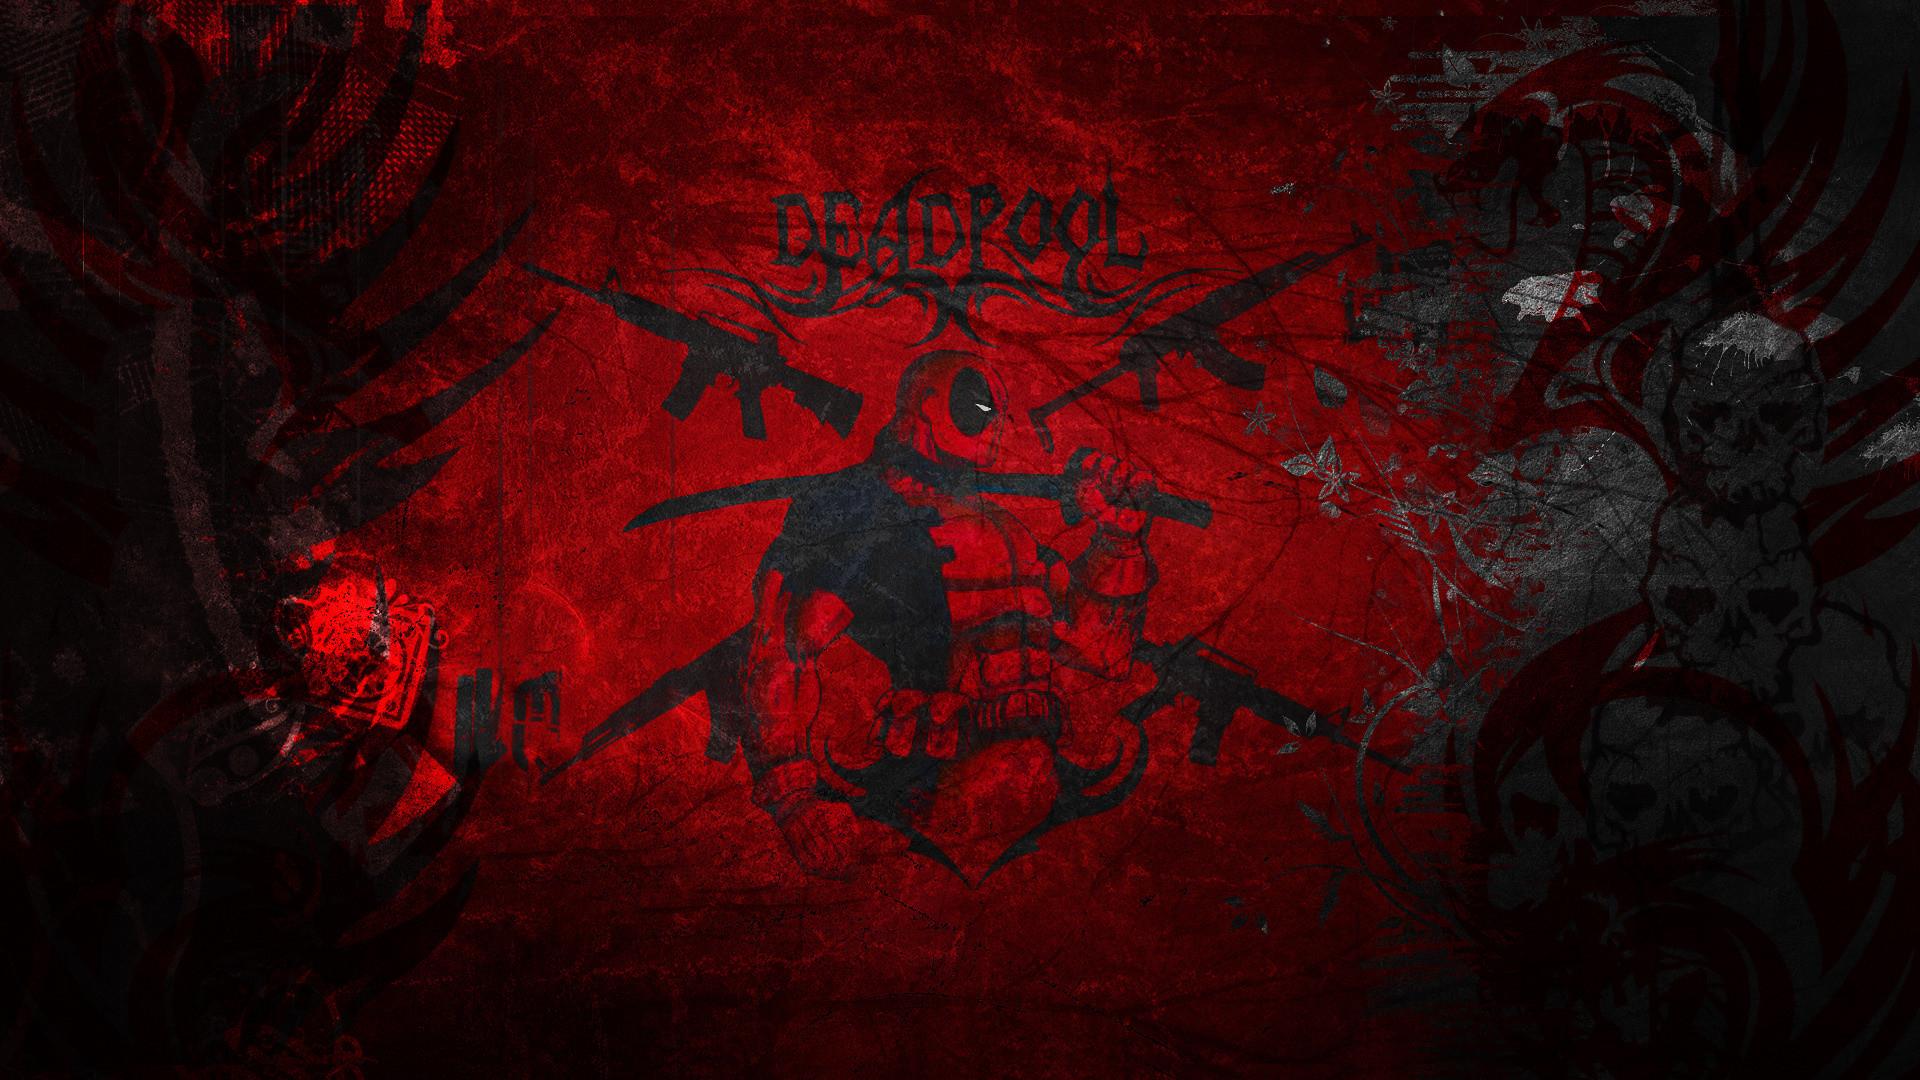 Wallpapers Deadpool | Wallpaper Deadpool | Pinterest | Deadpool, Deadpool  wallpaper and Marvel